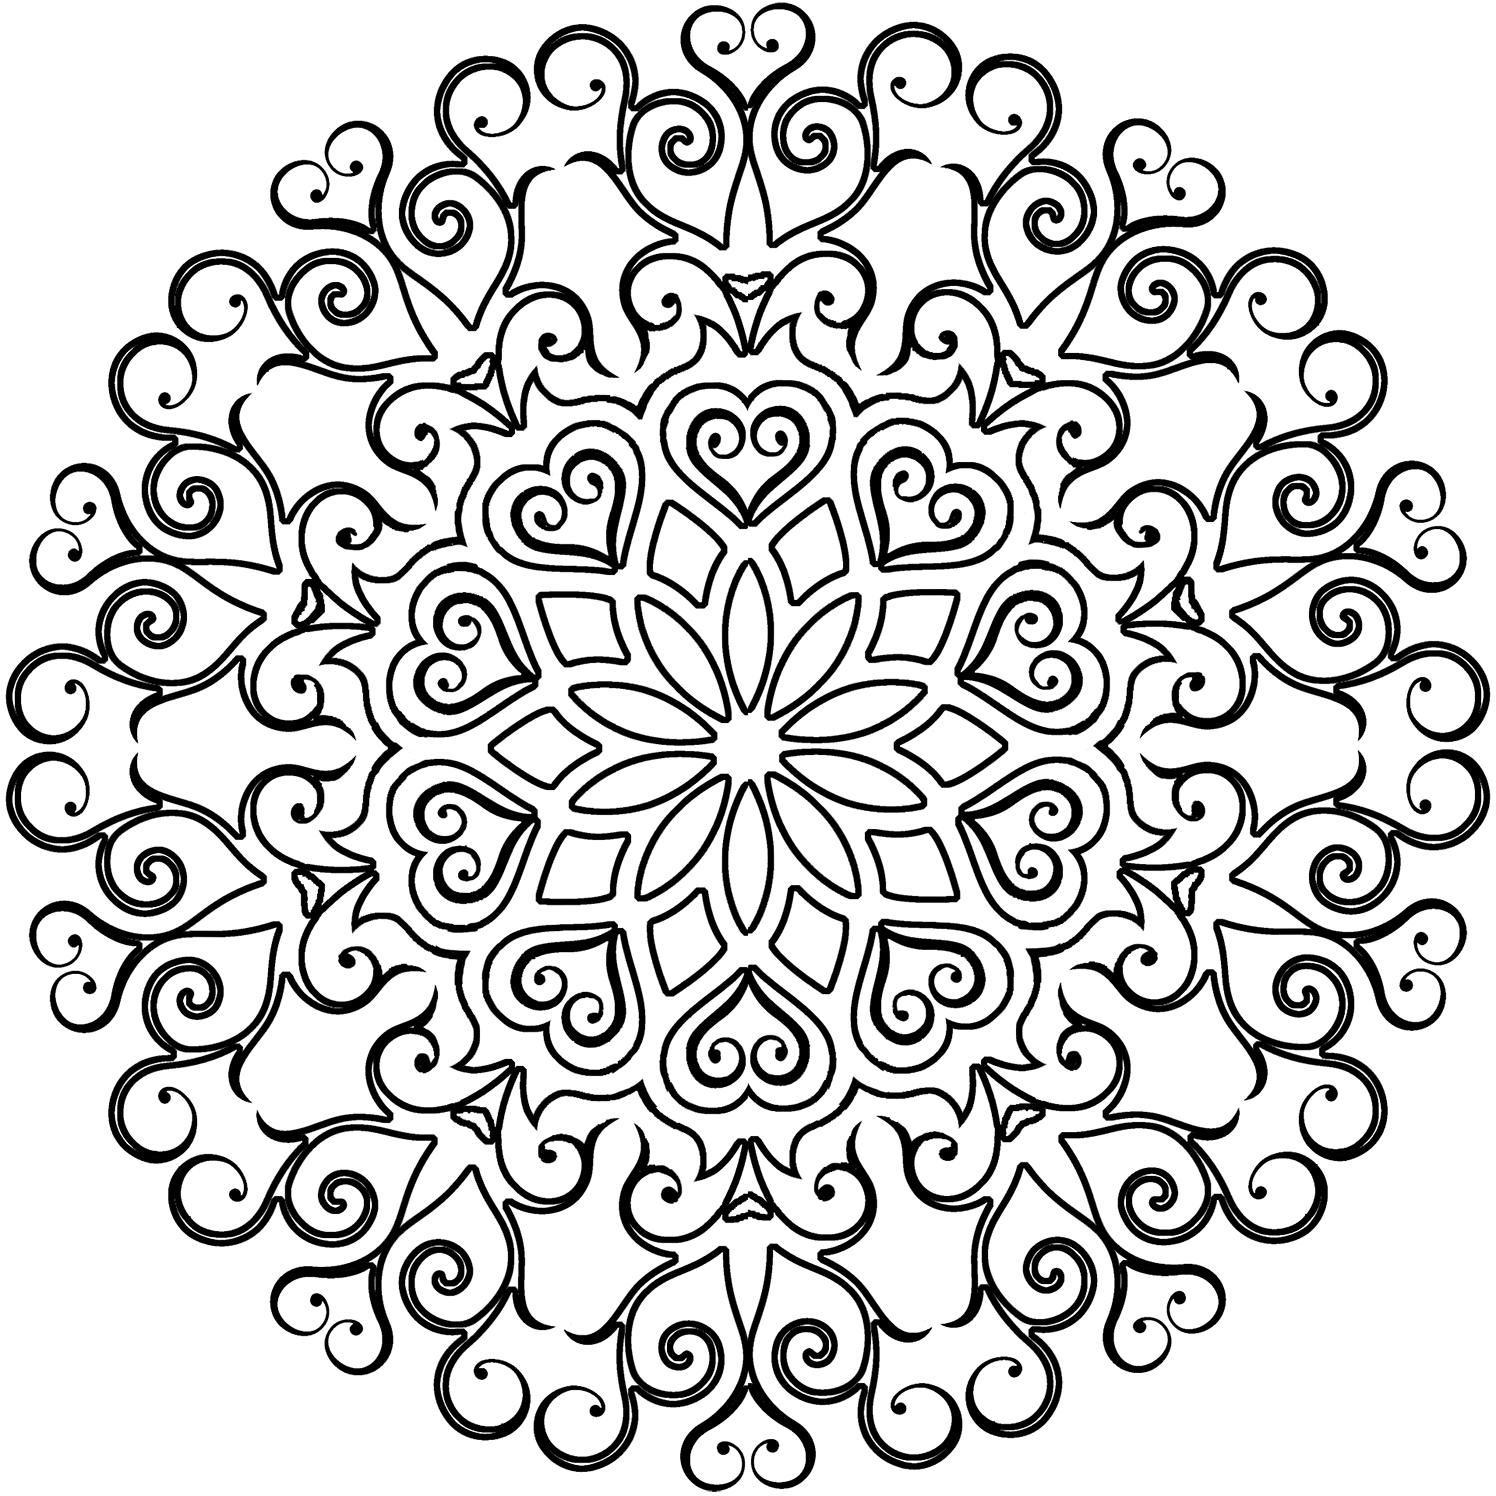 kaleidoscope-mandala-coloring page